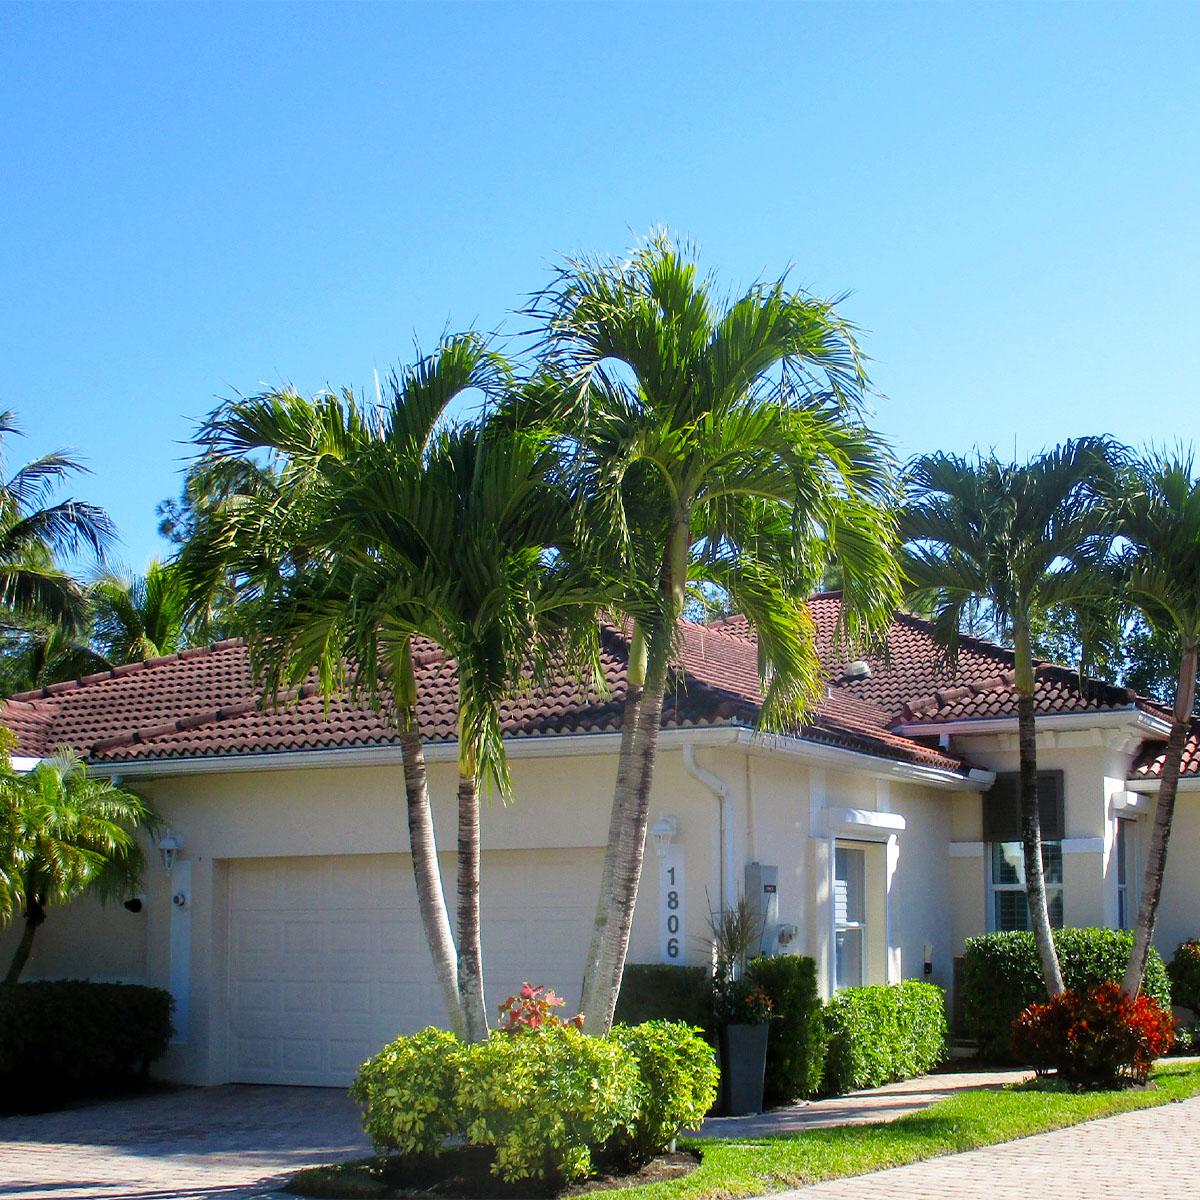 Cayman | Tarpon Bay Community Association, Inc. - Naples, Florida